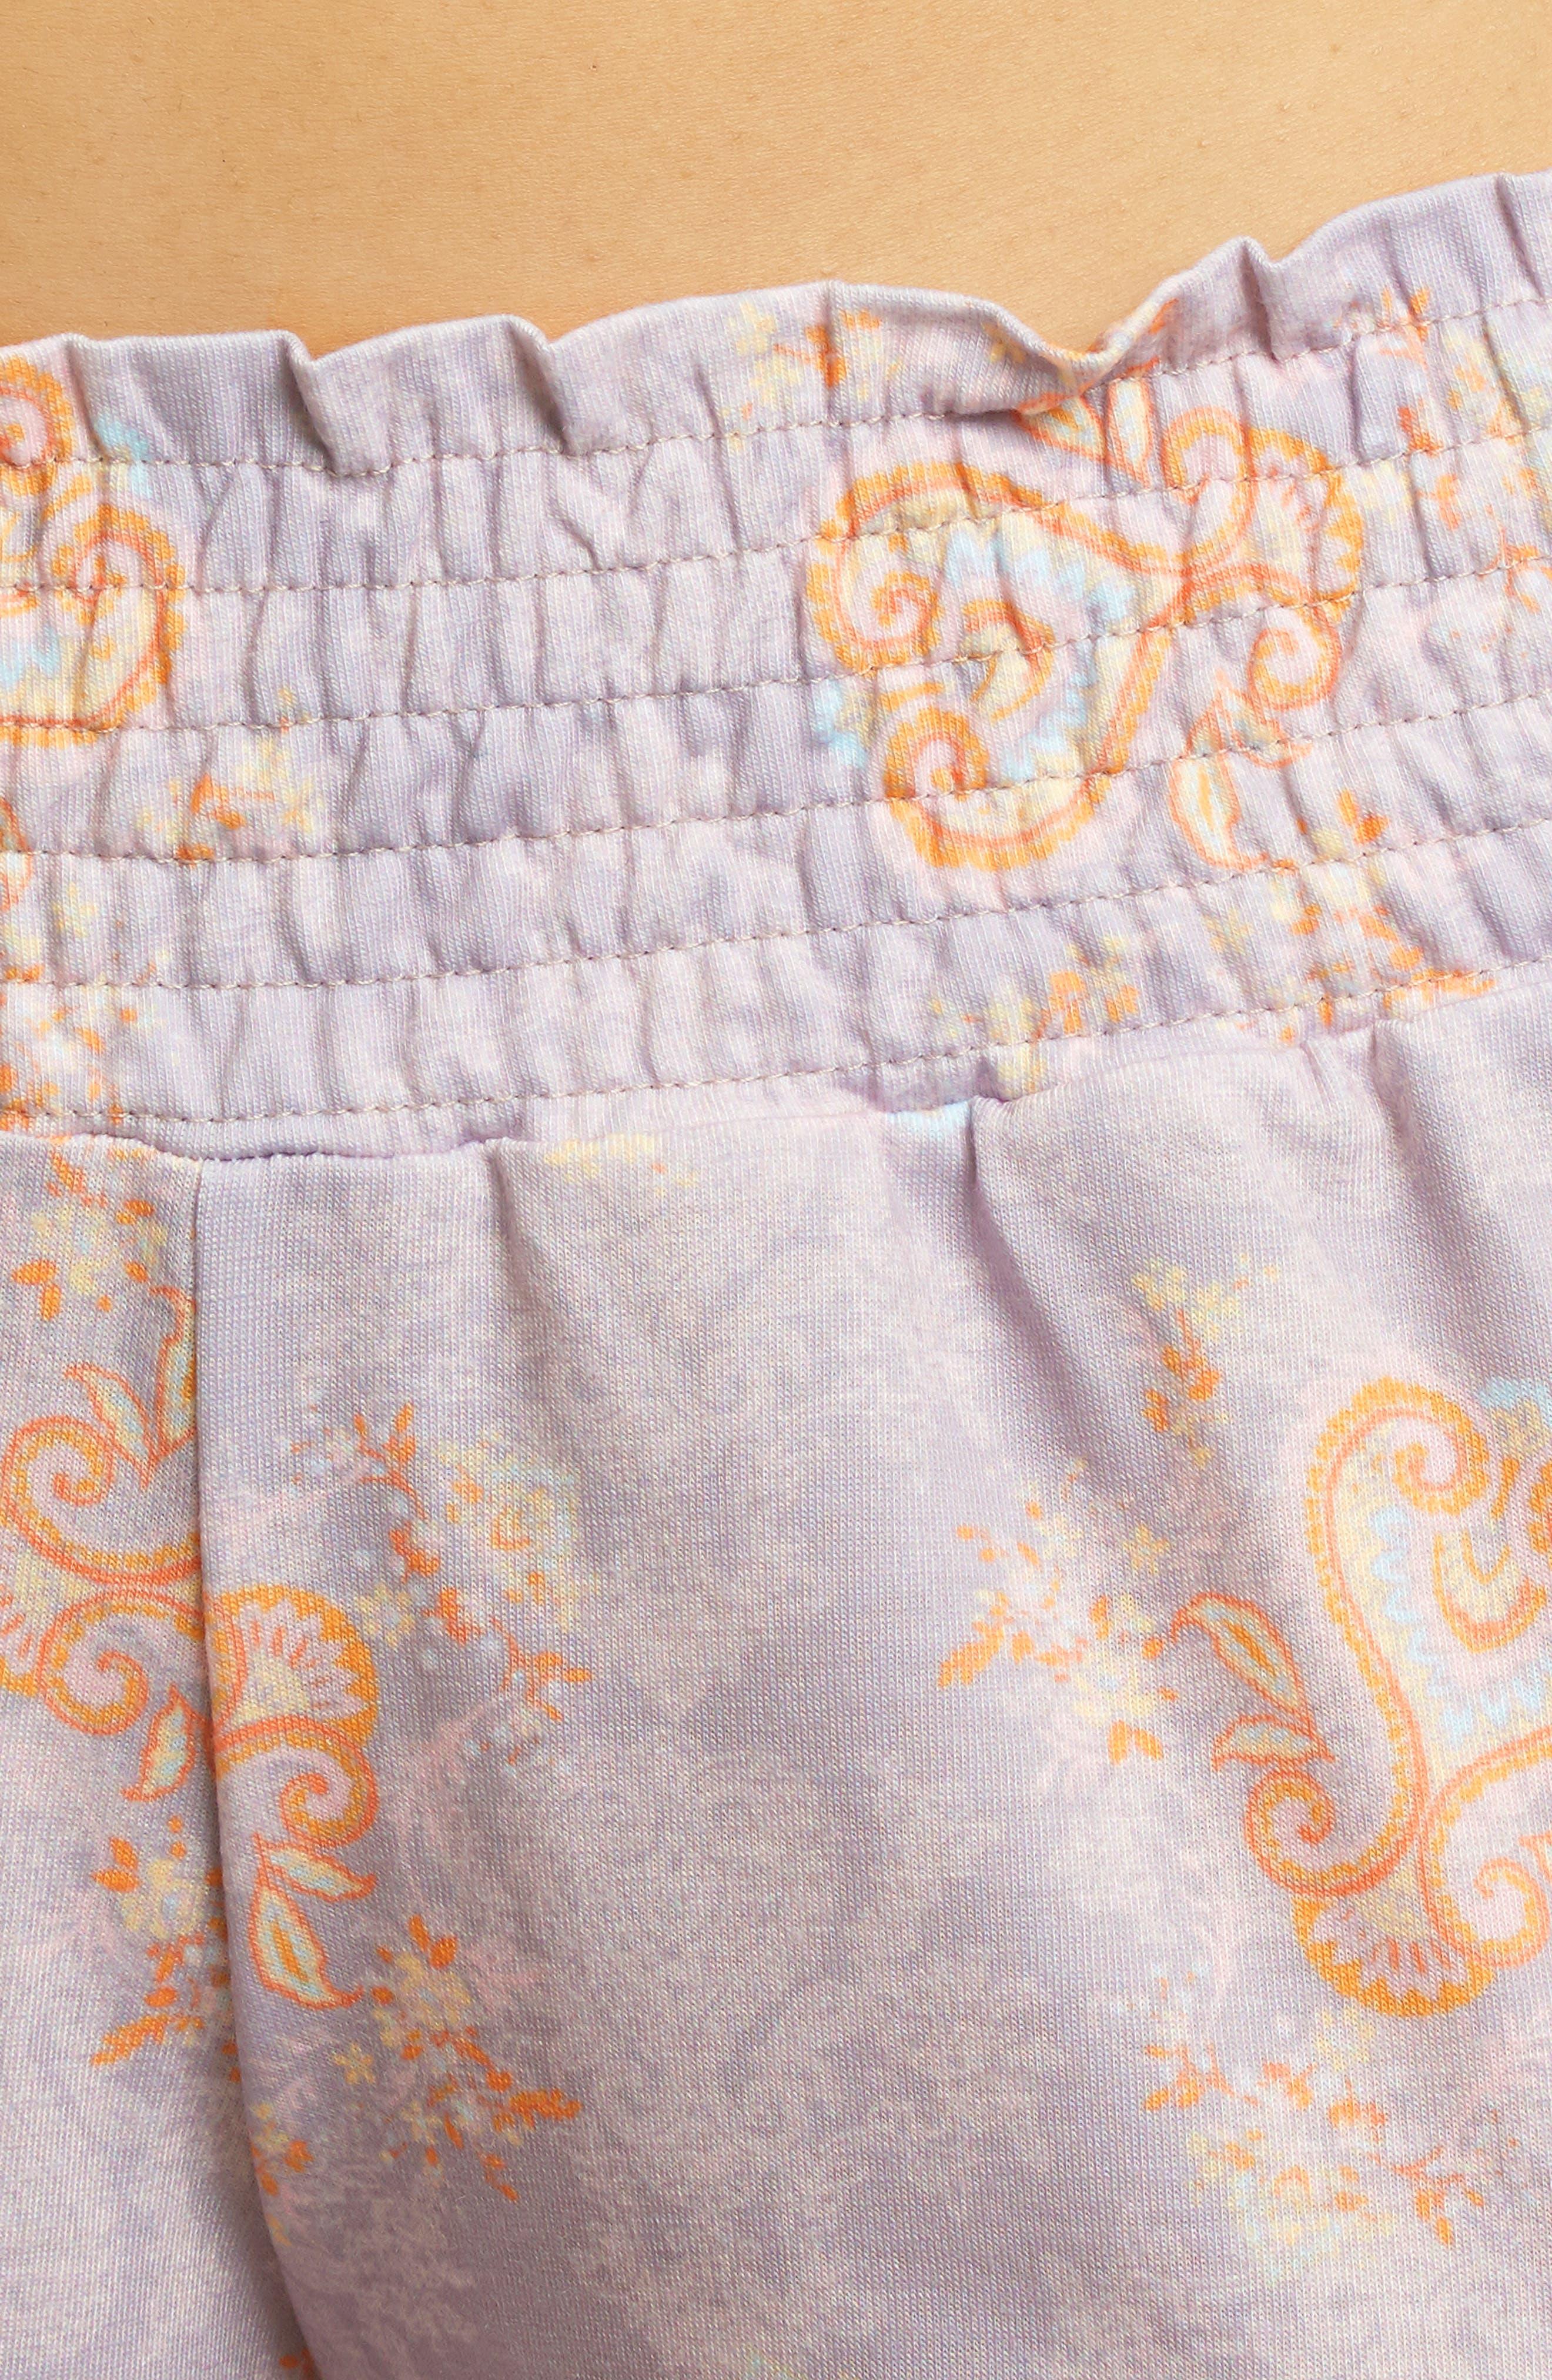 EVERLY GREY, Analise During & After 5-Piece Maternity/Nursing Sleep Set, Alternate thumbnail 4, color, BOHO